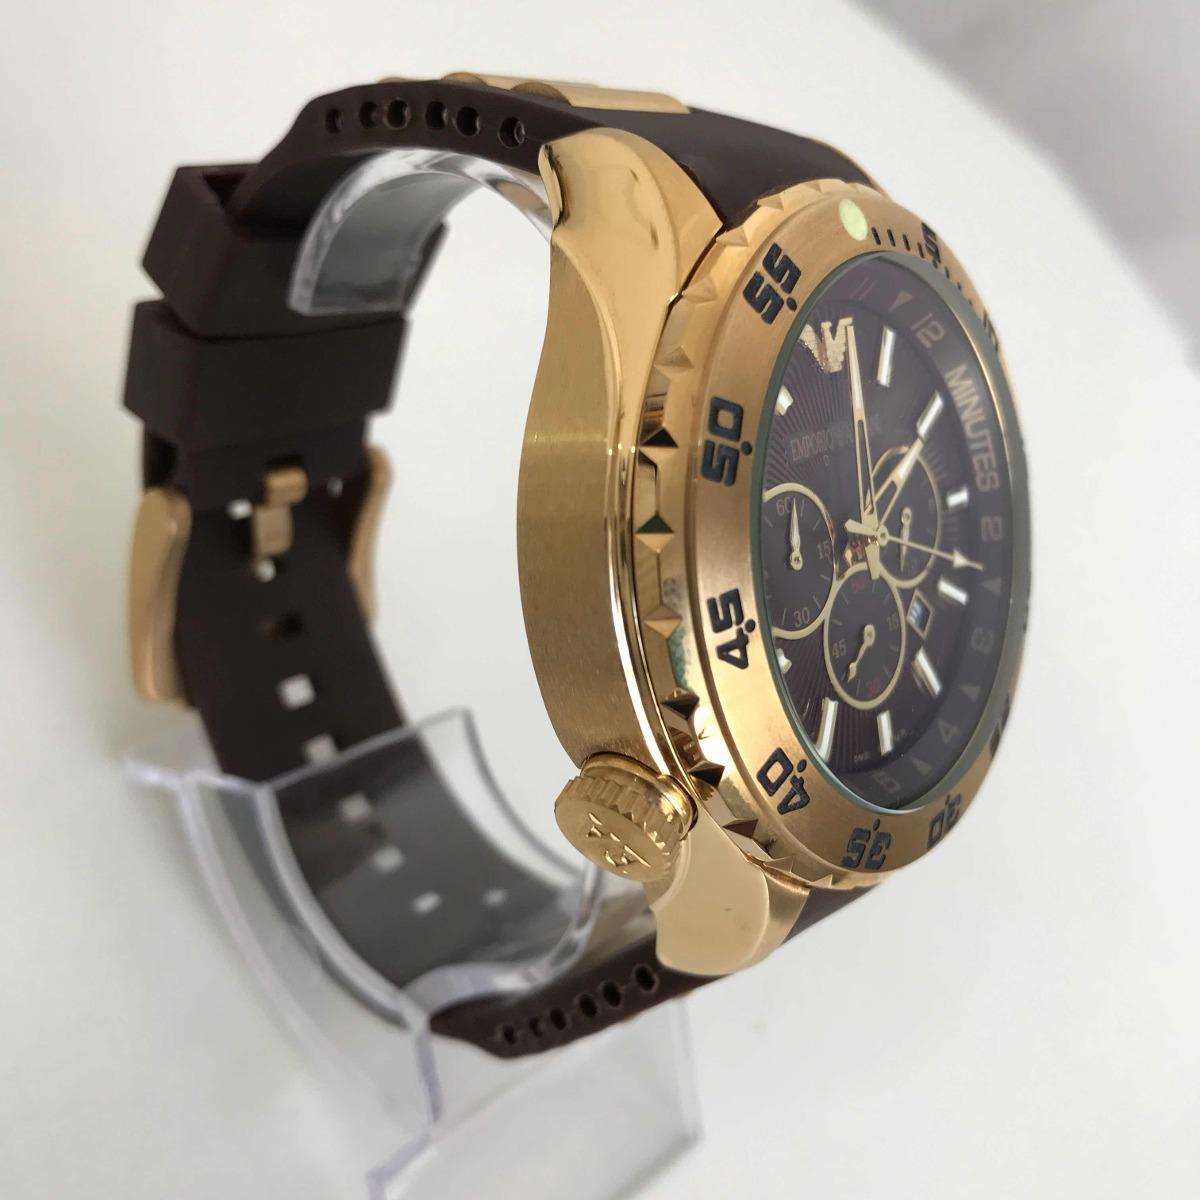 f429b7fbb67 Relógio Emporio Armani 0690 Dourado